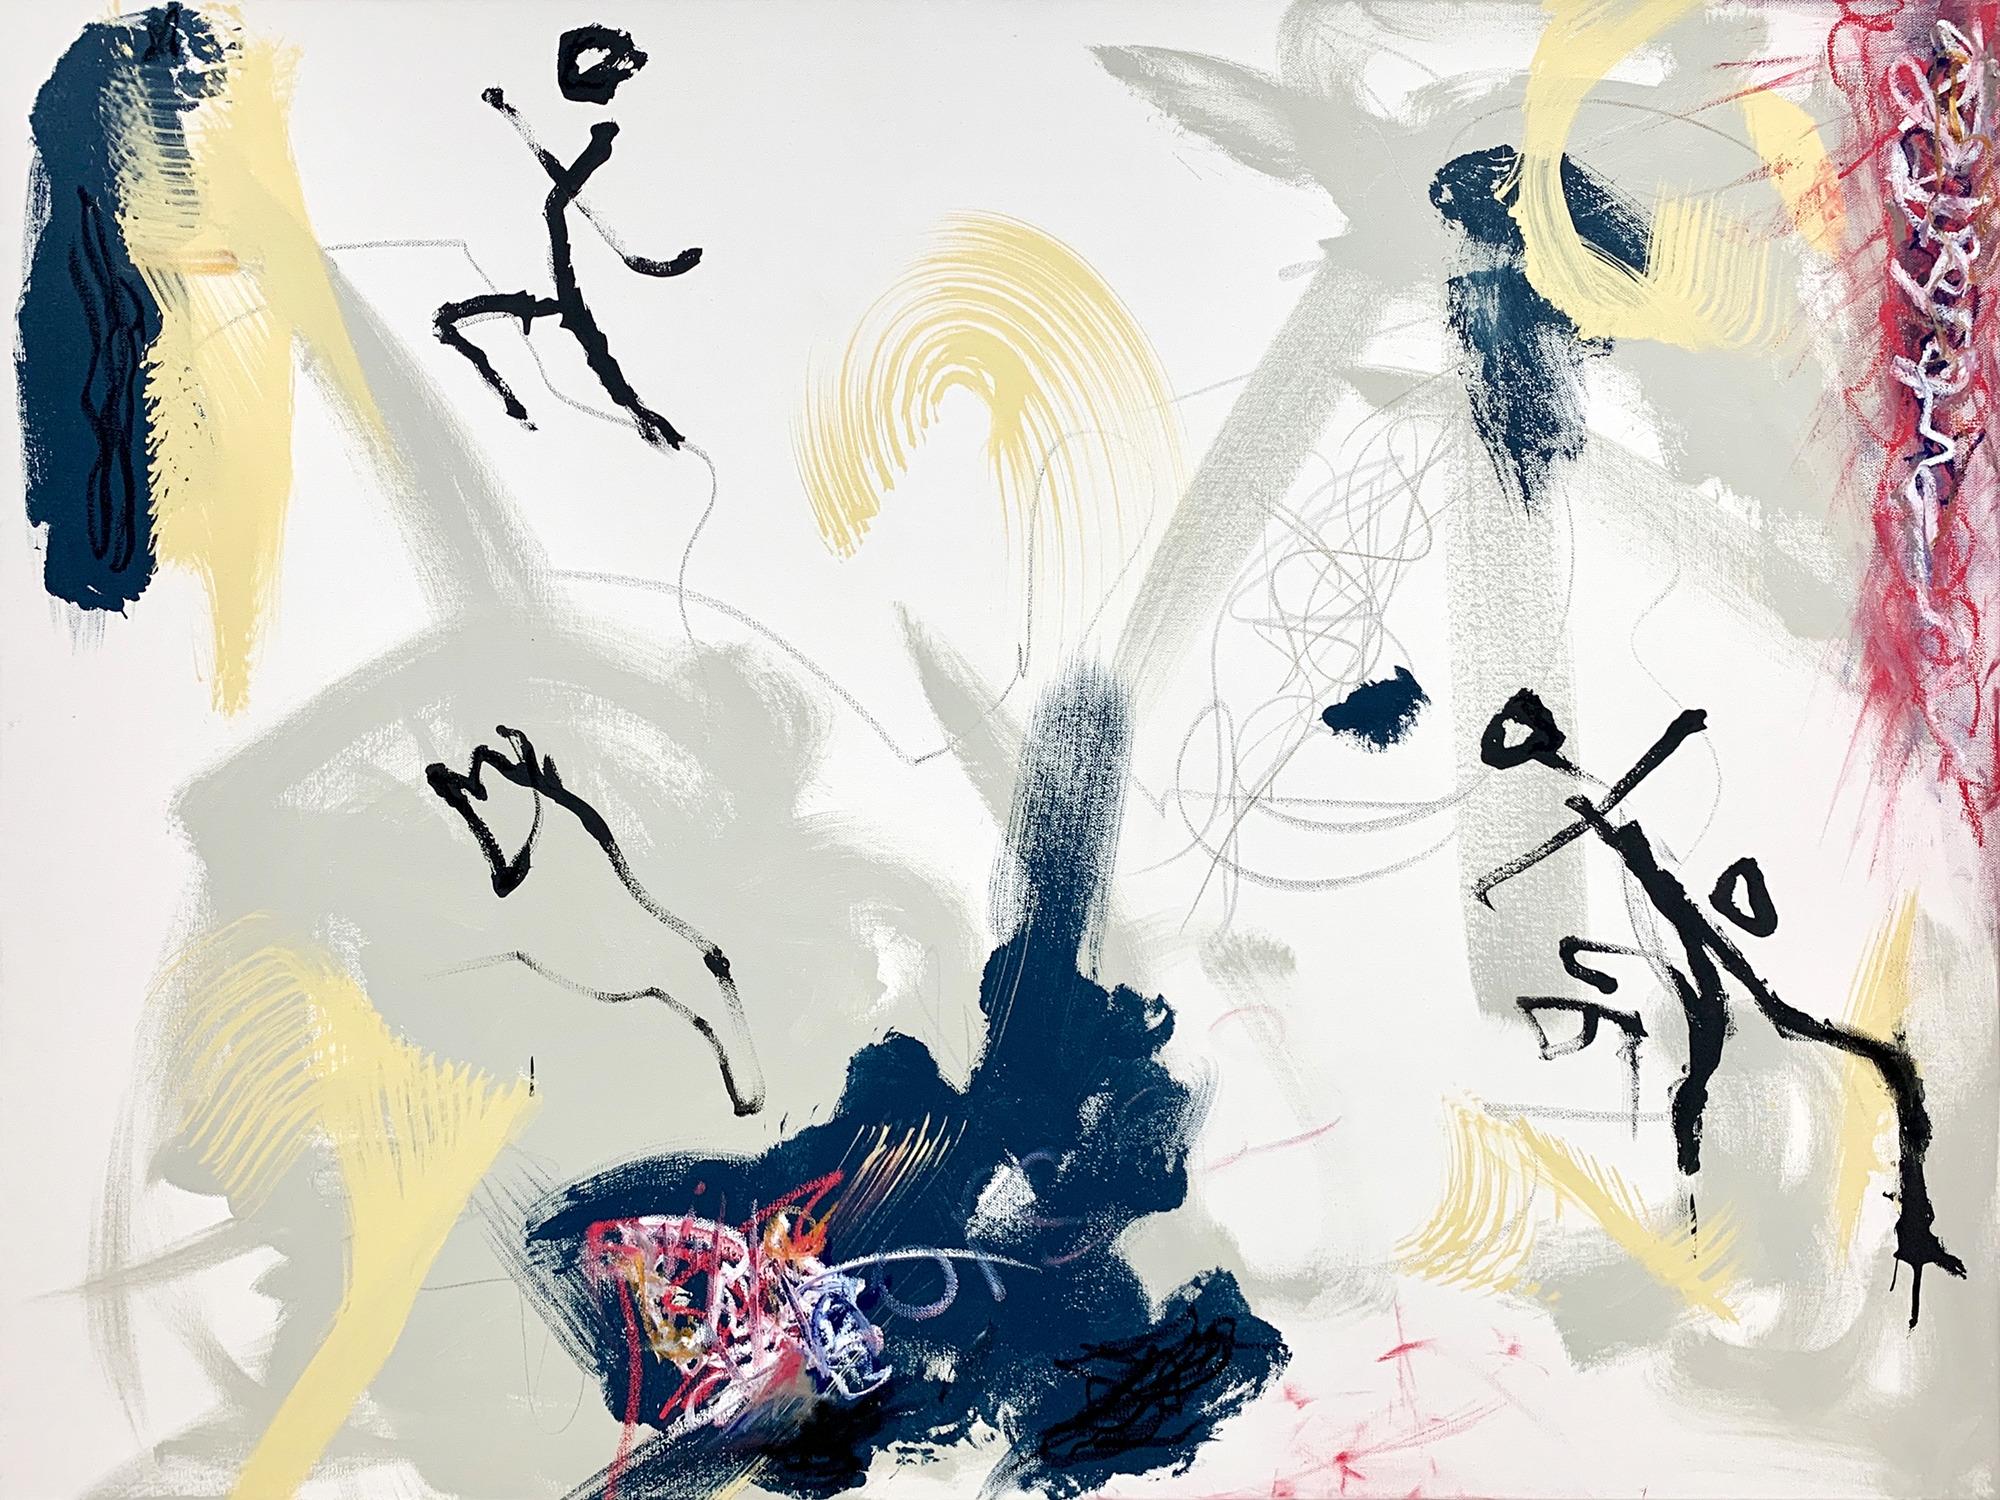 Katewilson.wildhorses.paintingoncanvas.30x40inches.lr.2019 vkjg8b